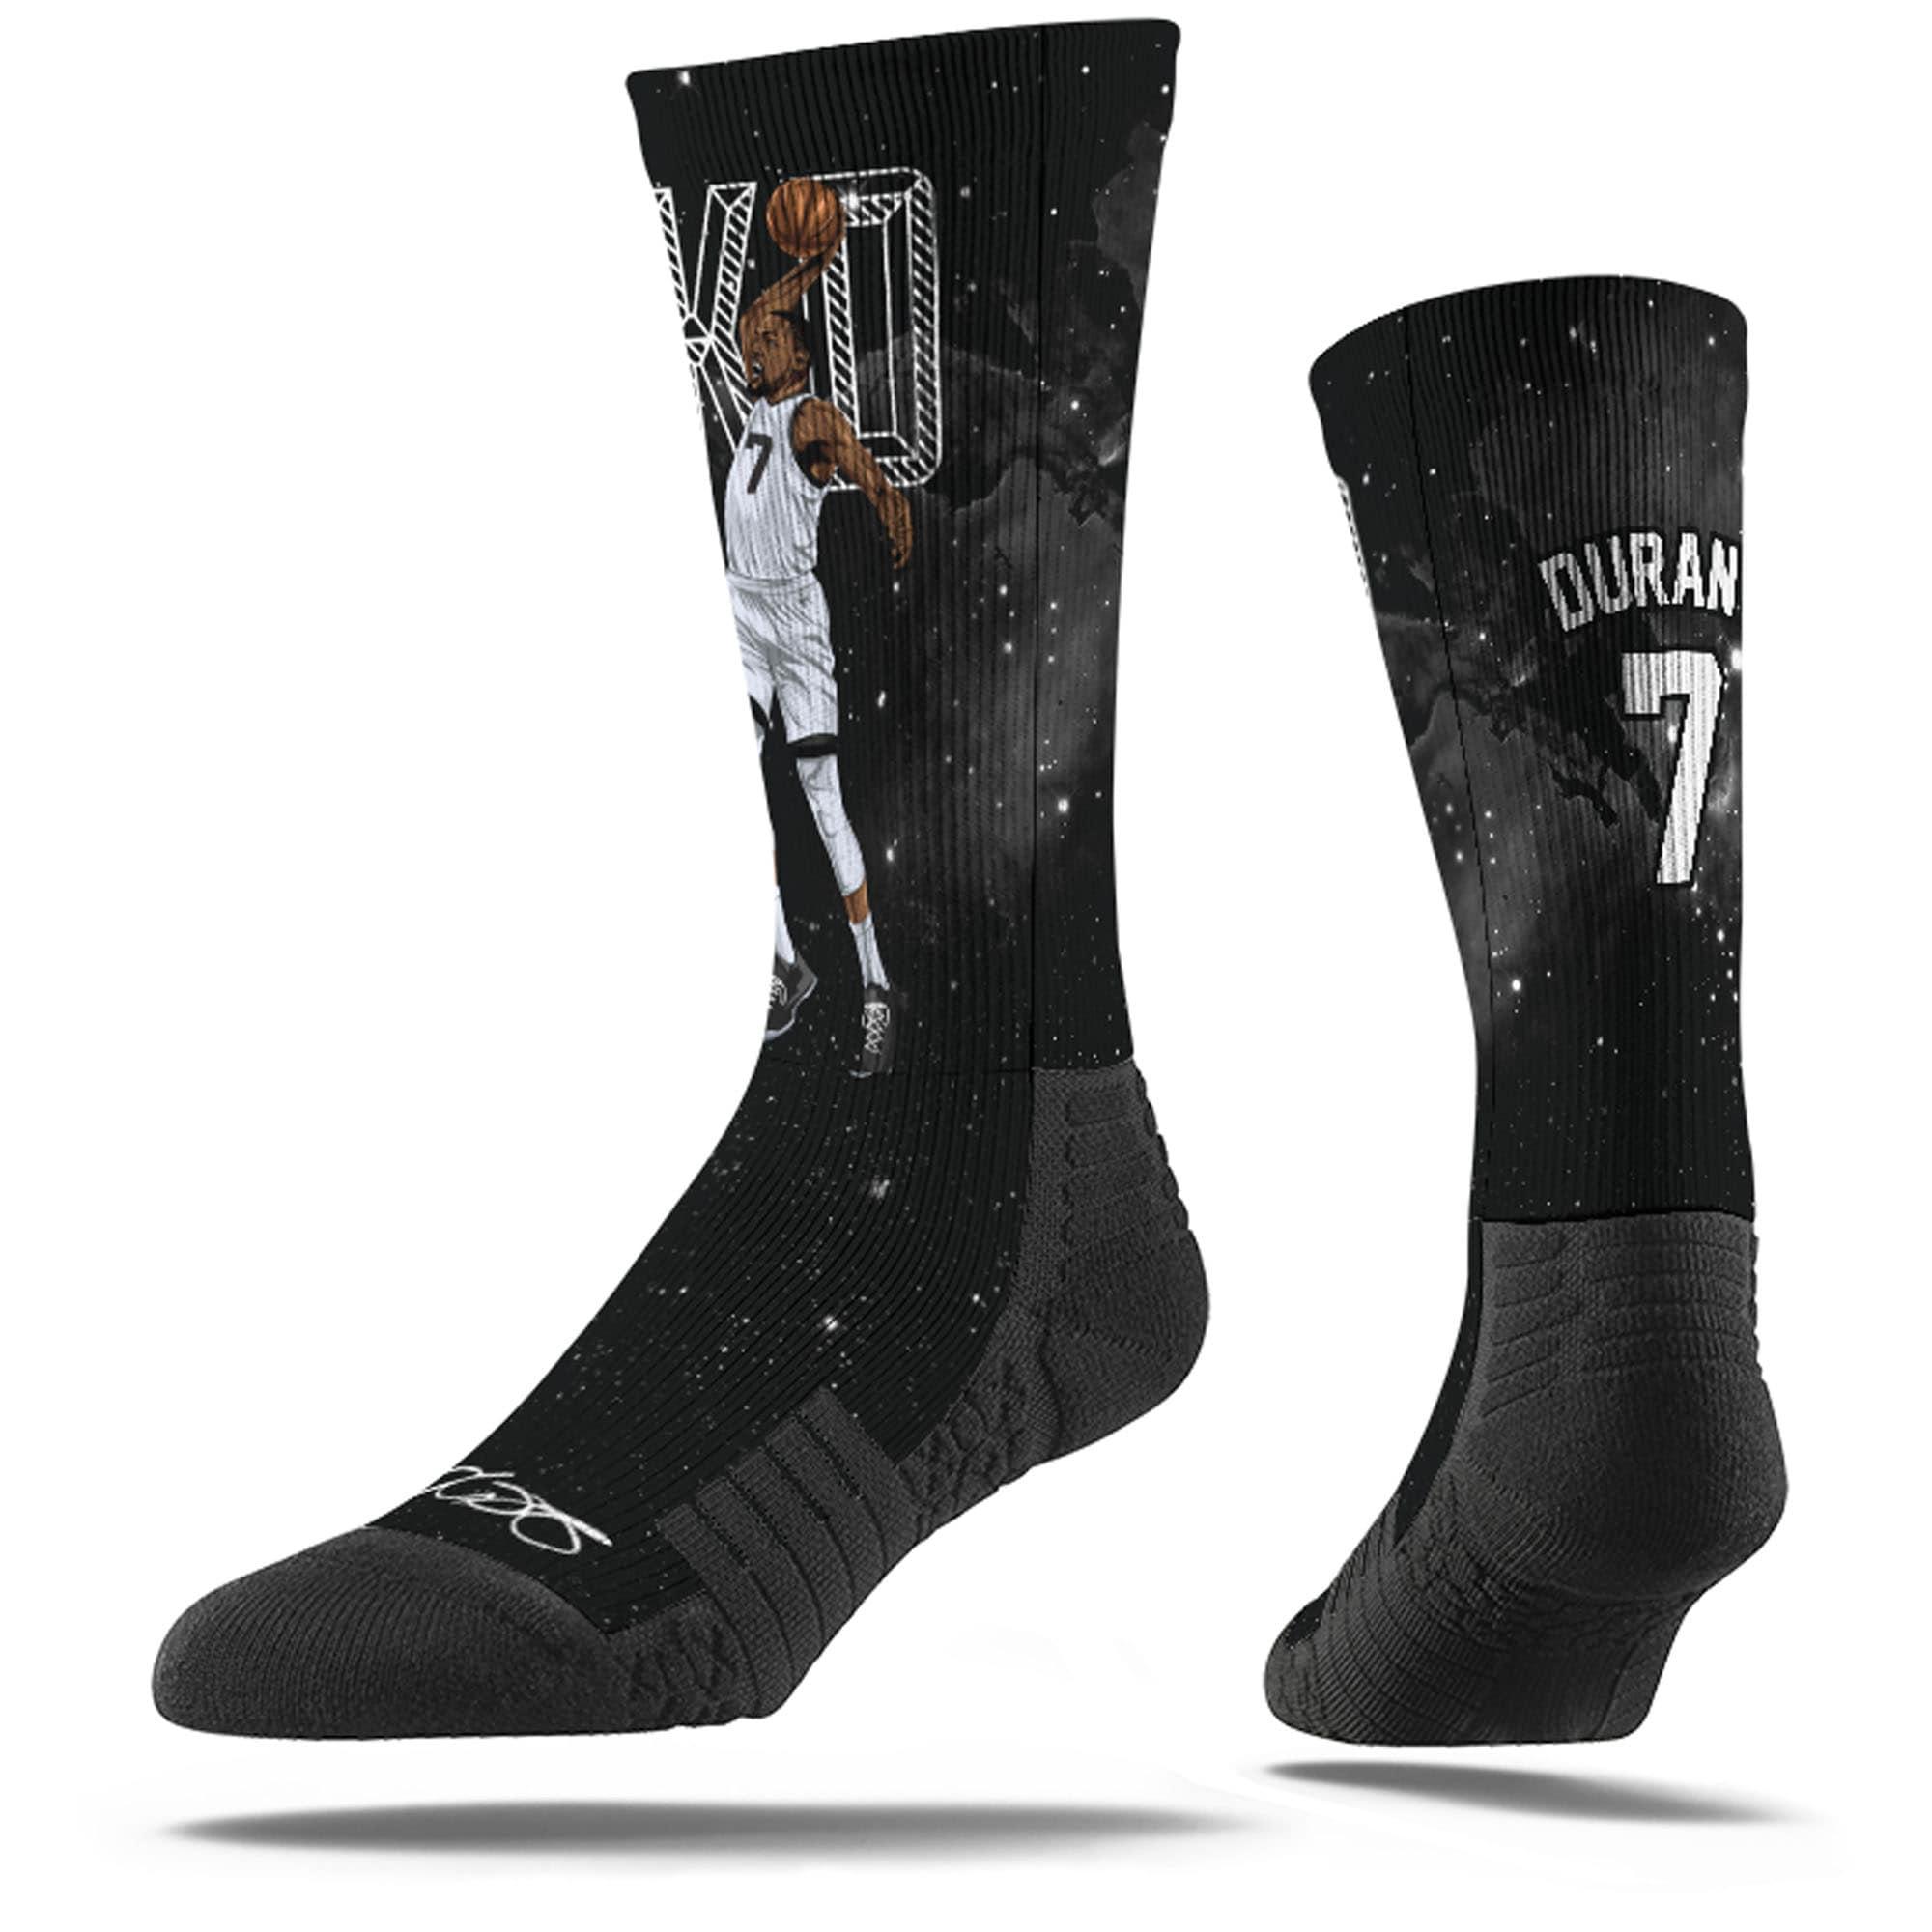 Kevin Durant Brooklyn Nets Strideline Premium Comfy Crew Socks - Black